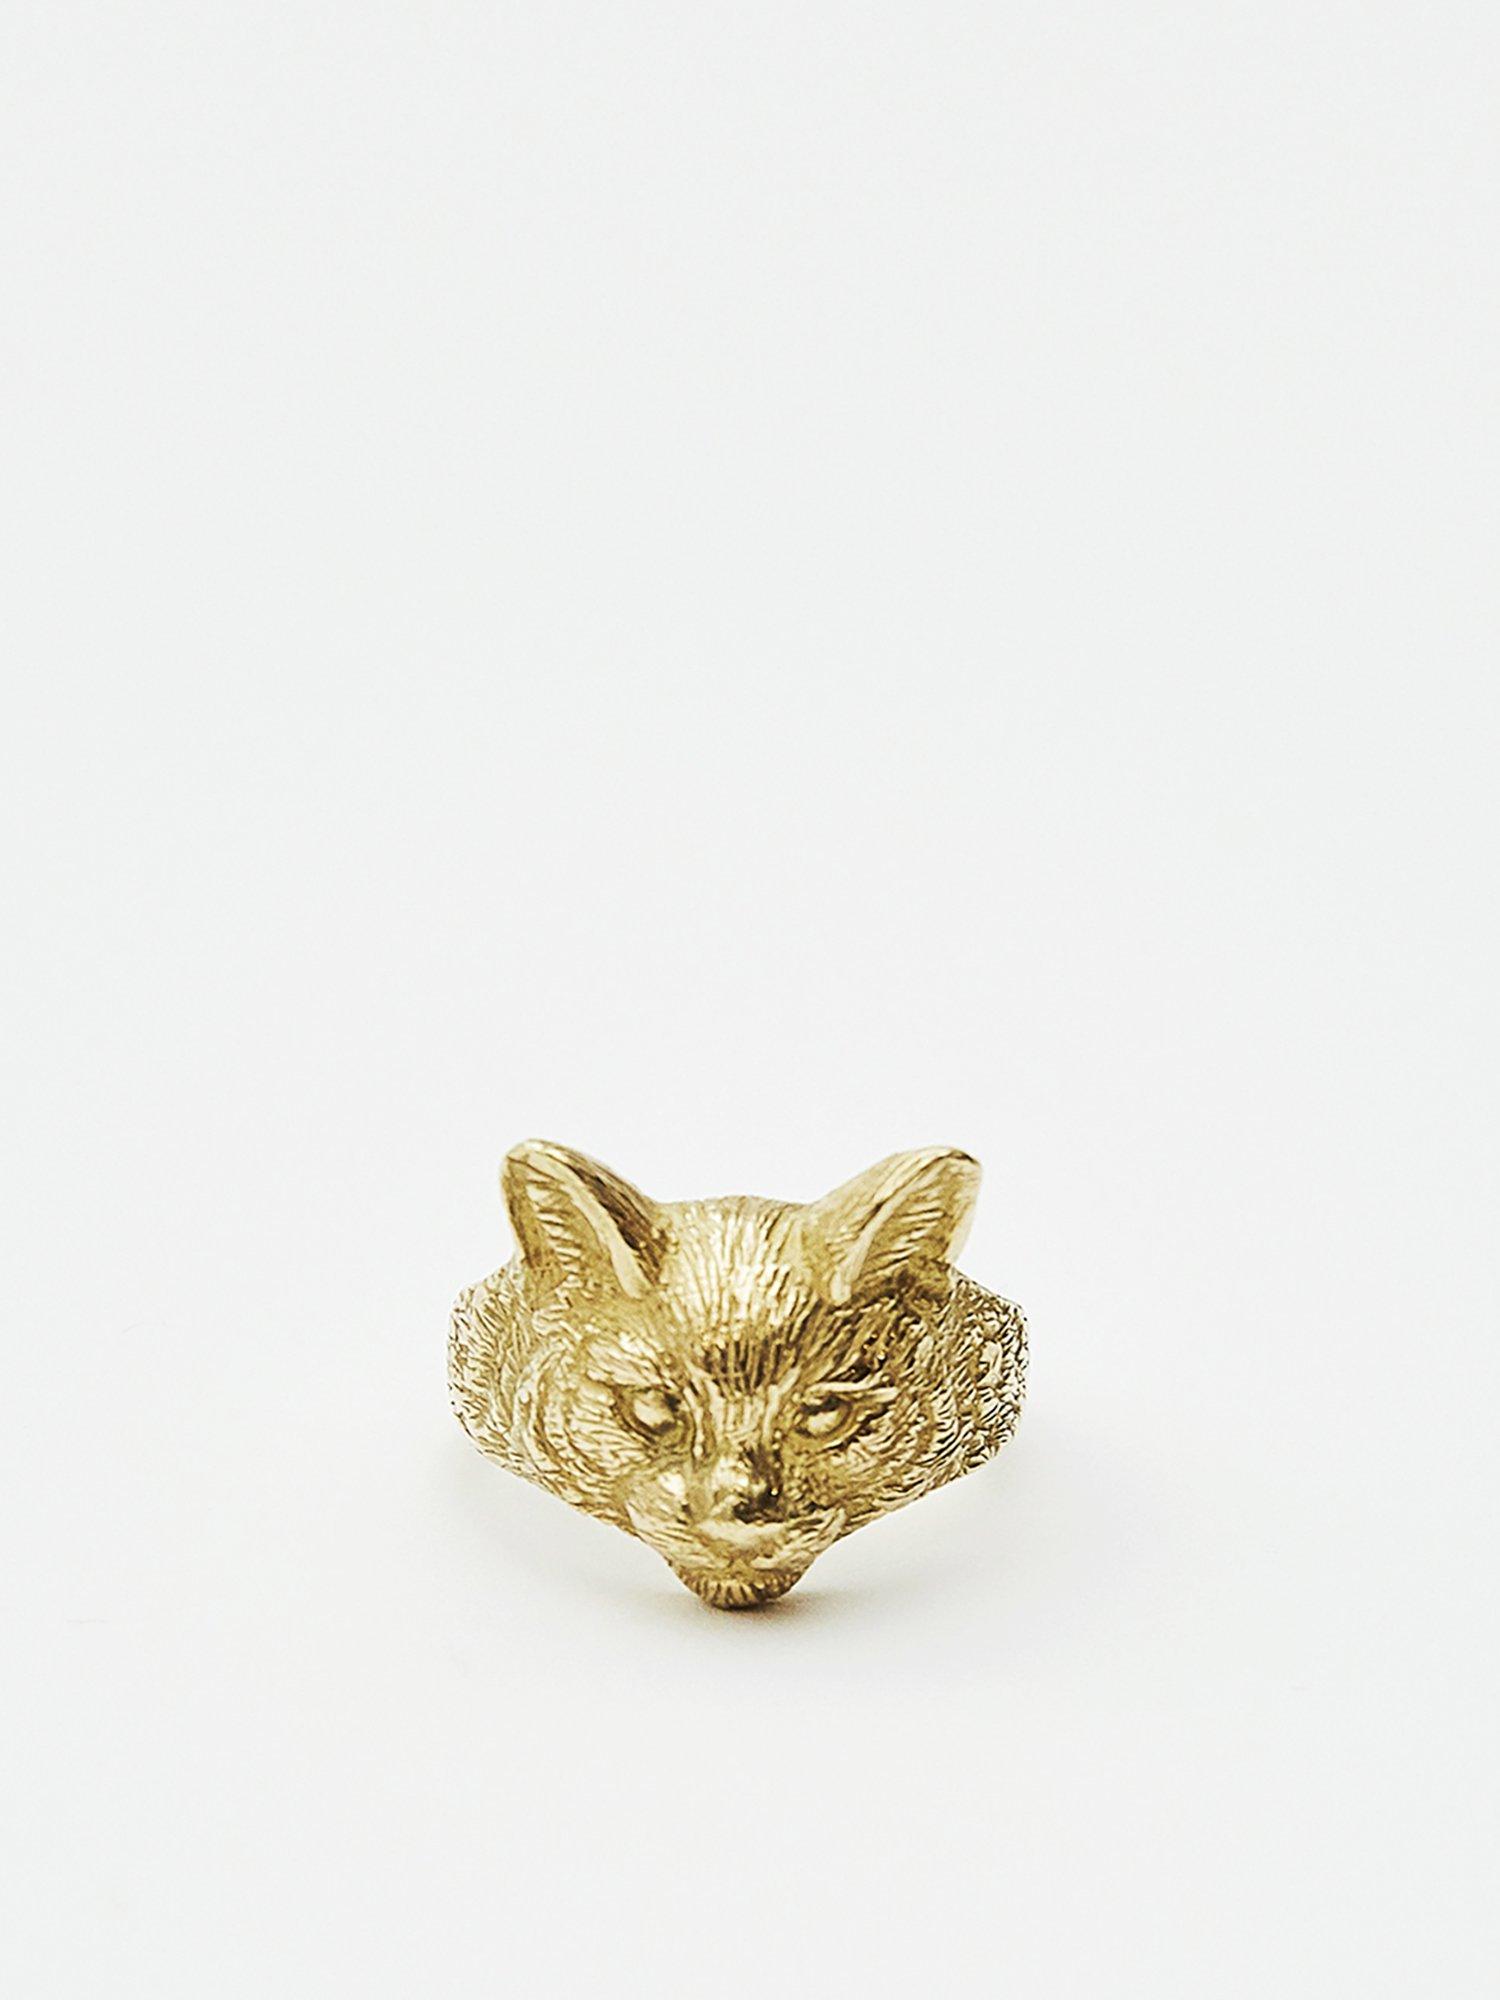 LOLO / Miaou ring 13号 / 在庫商品